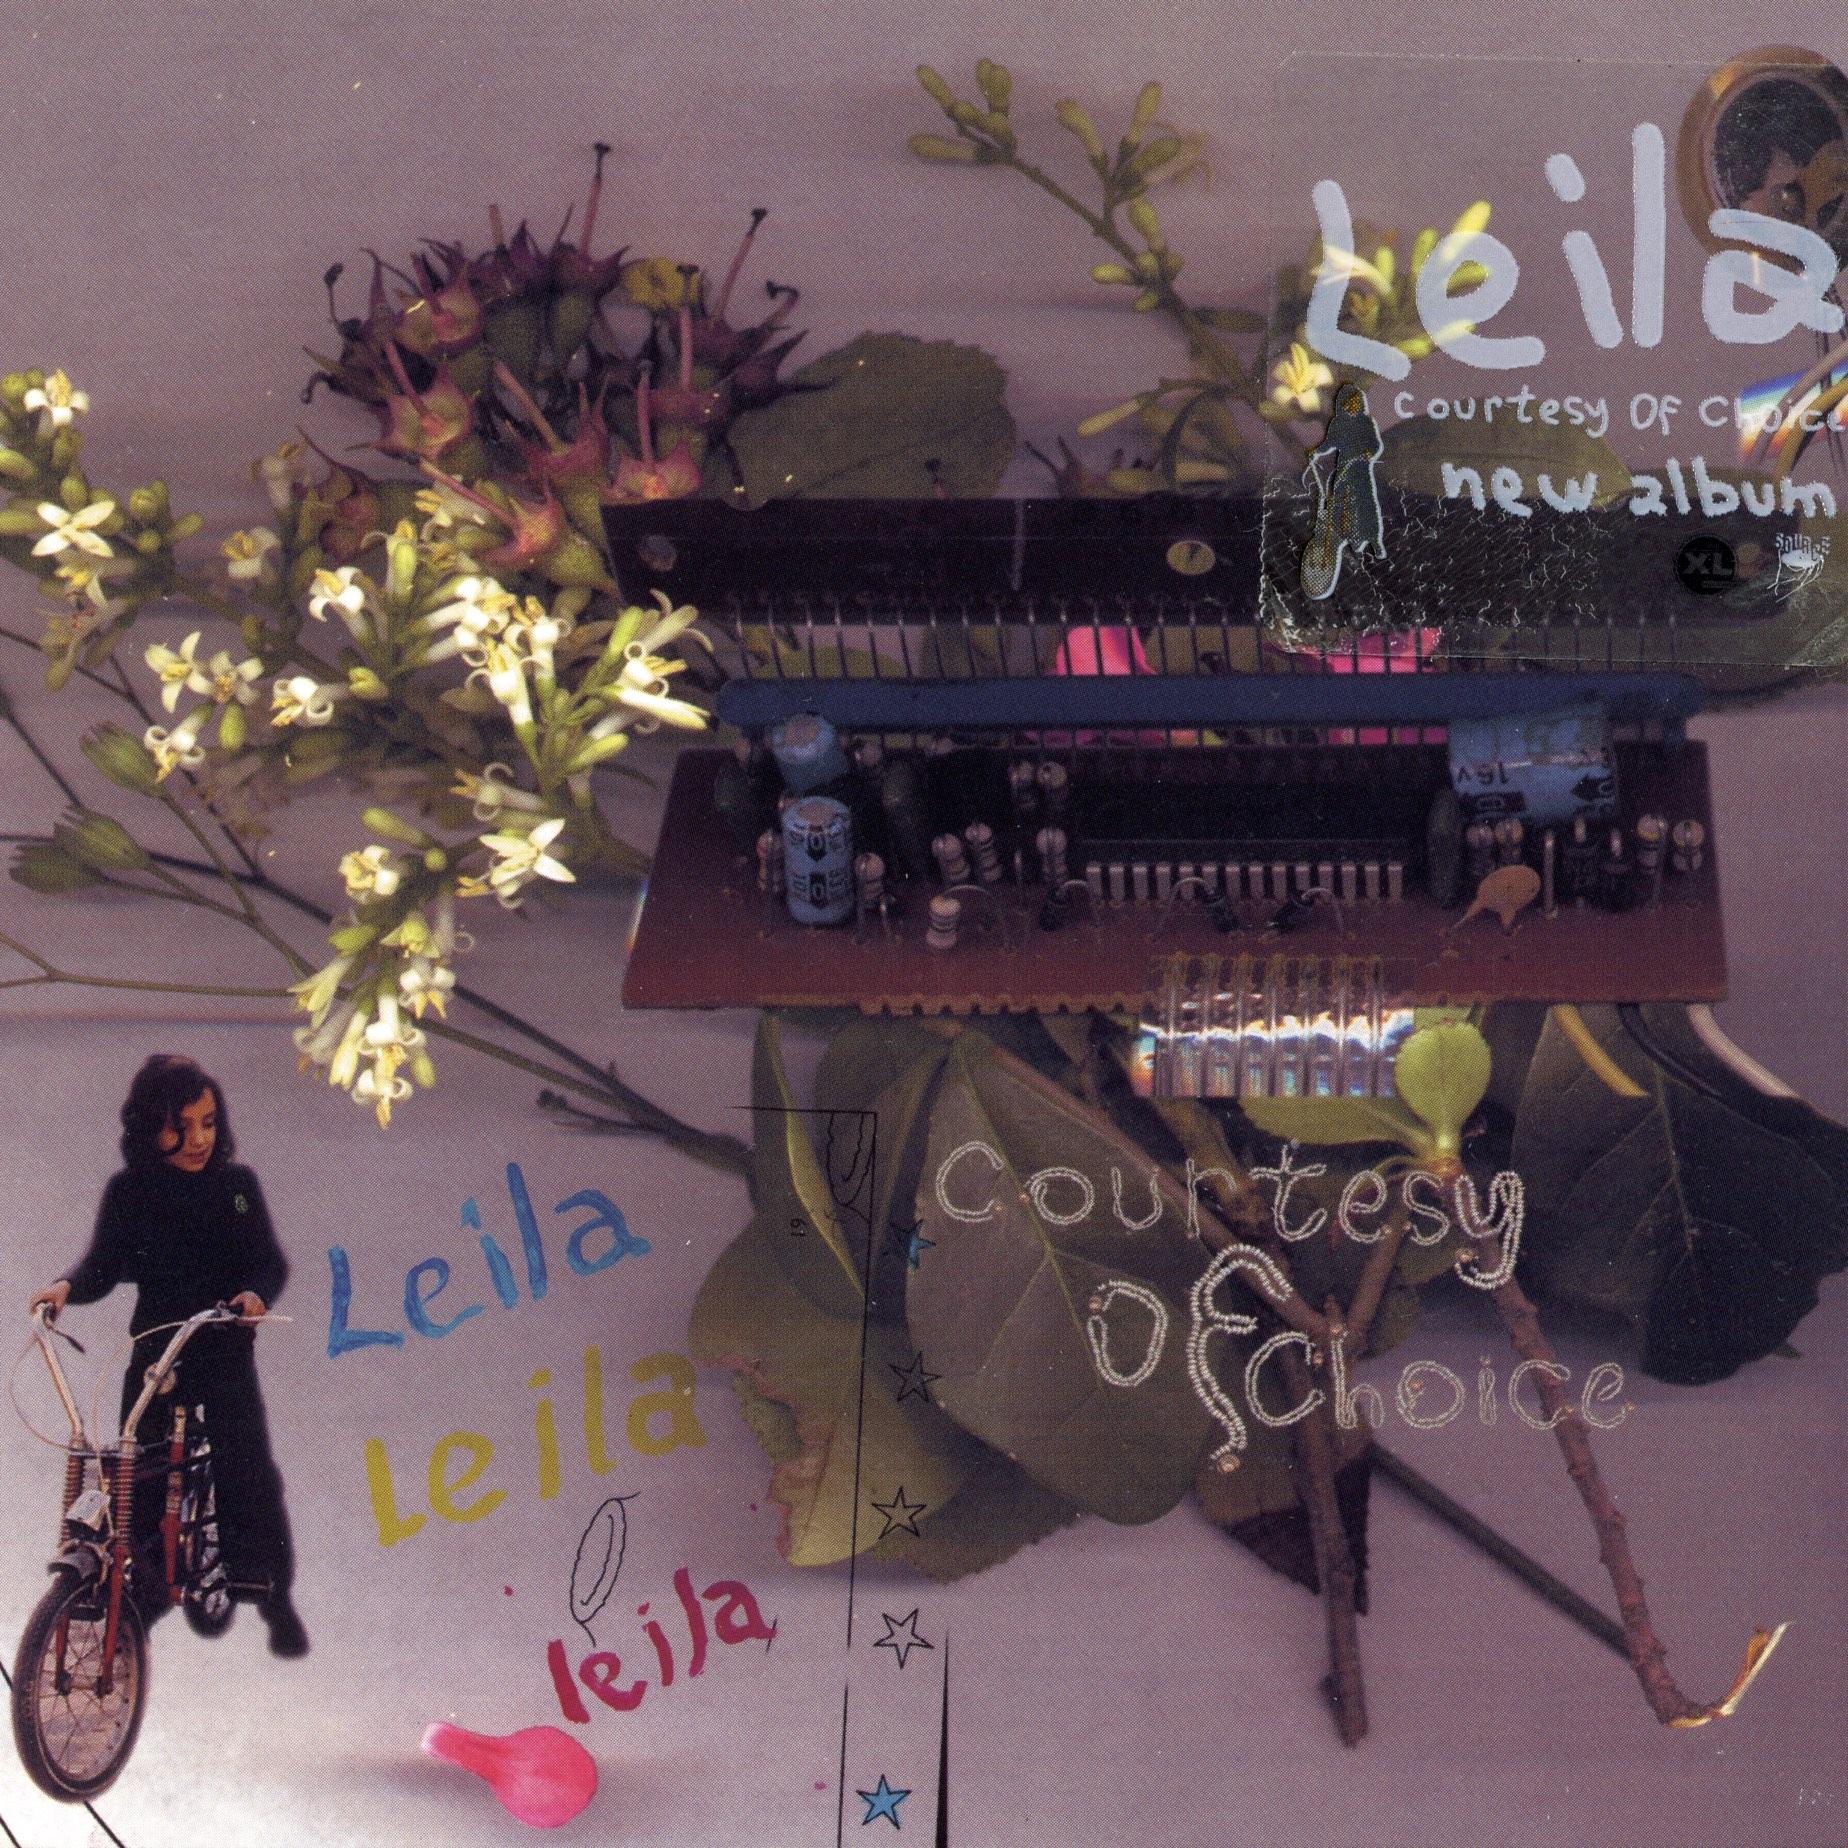 2000 - Leila